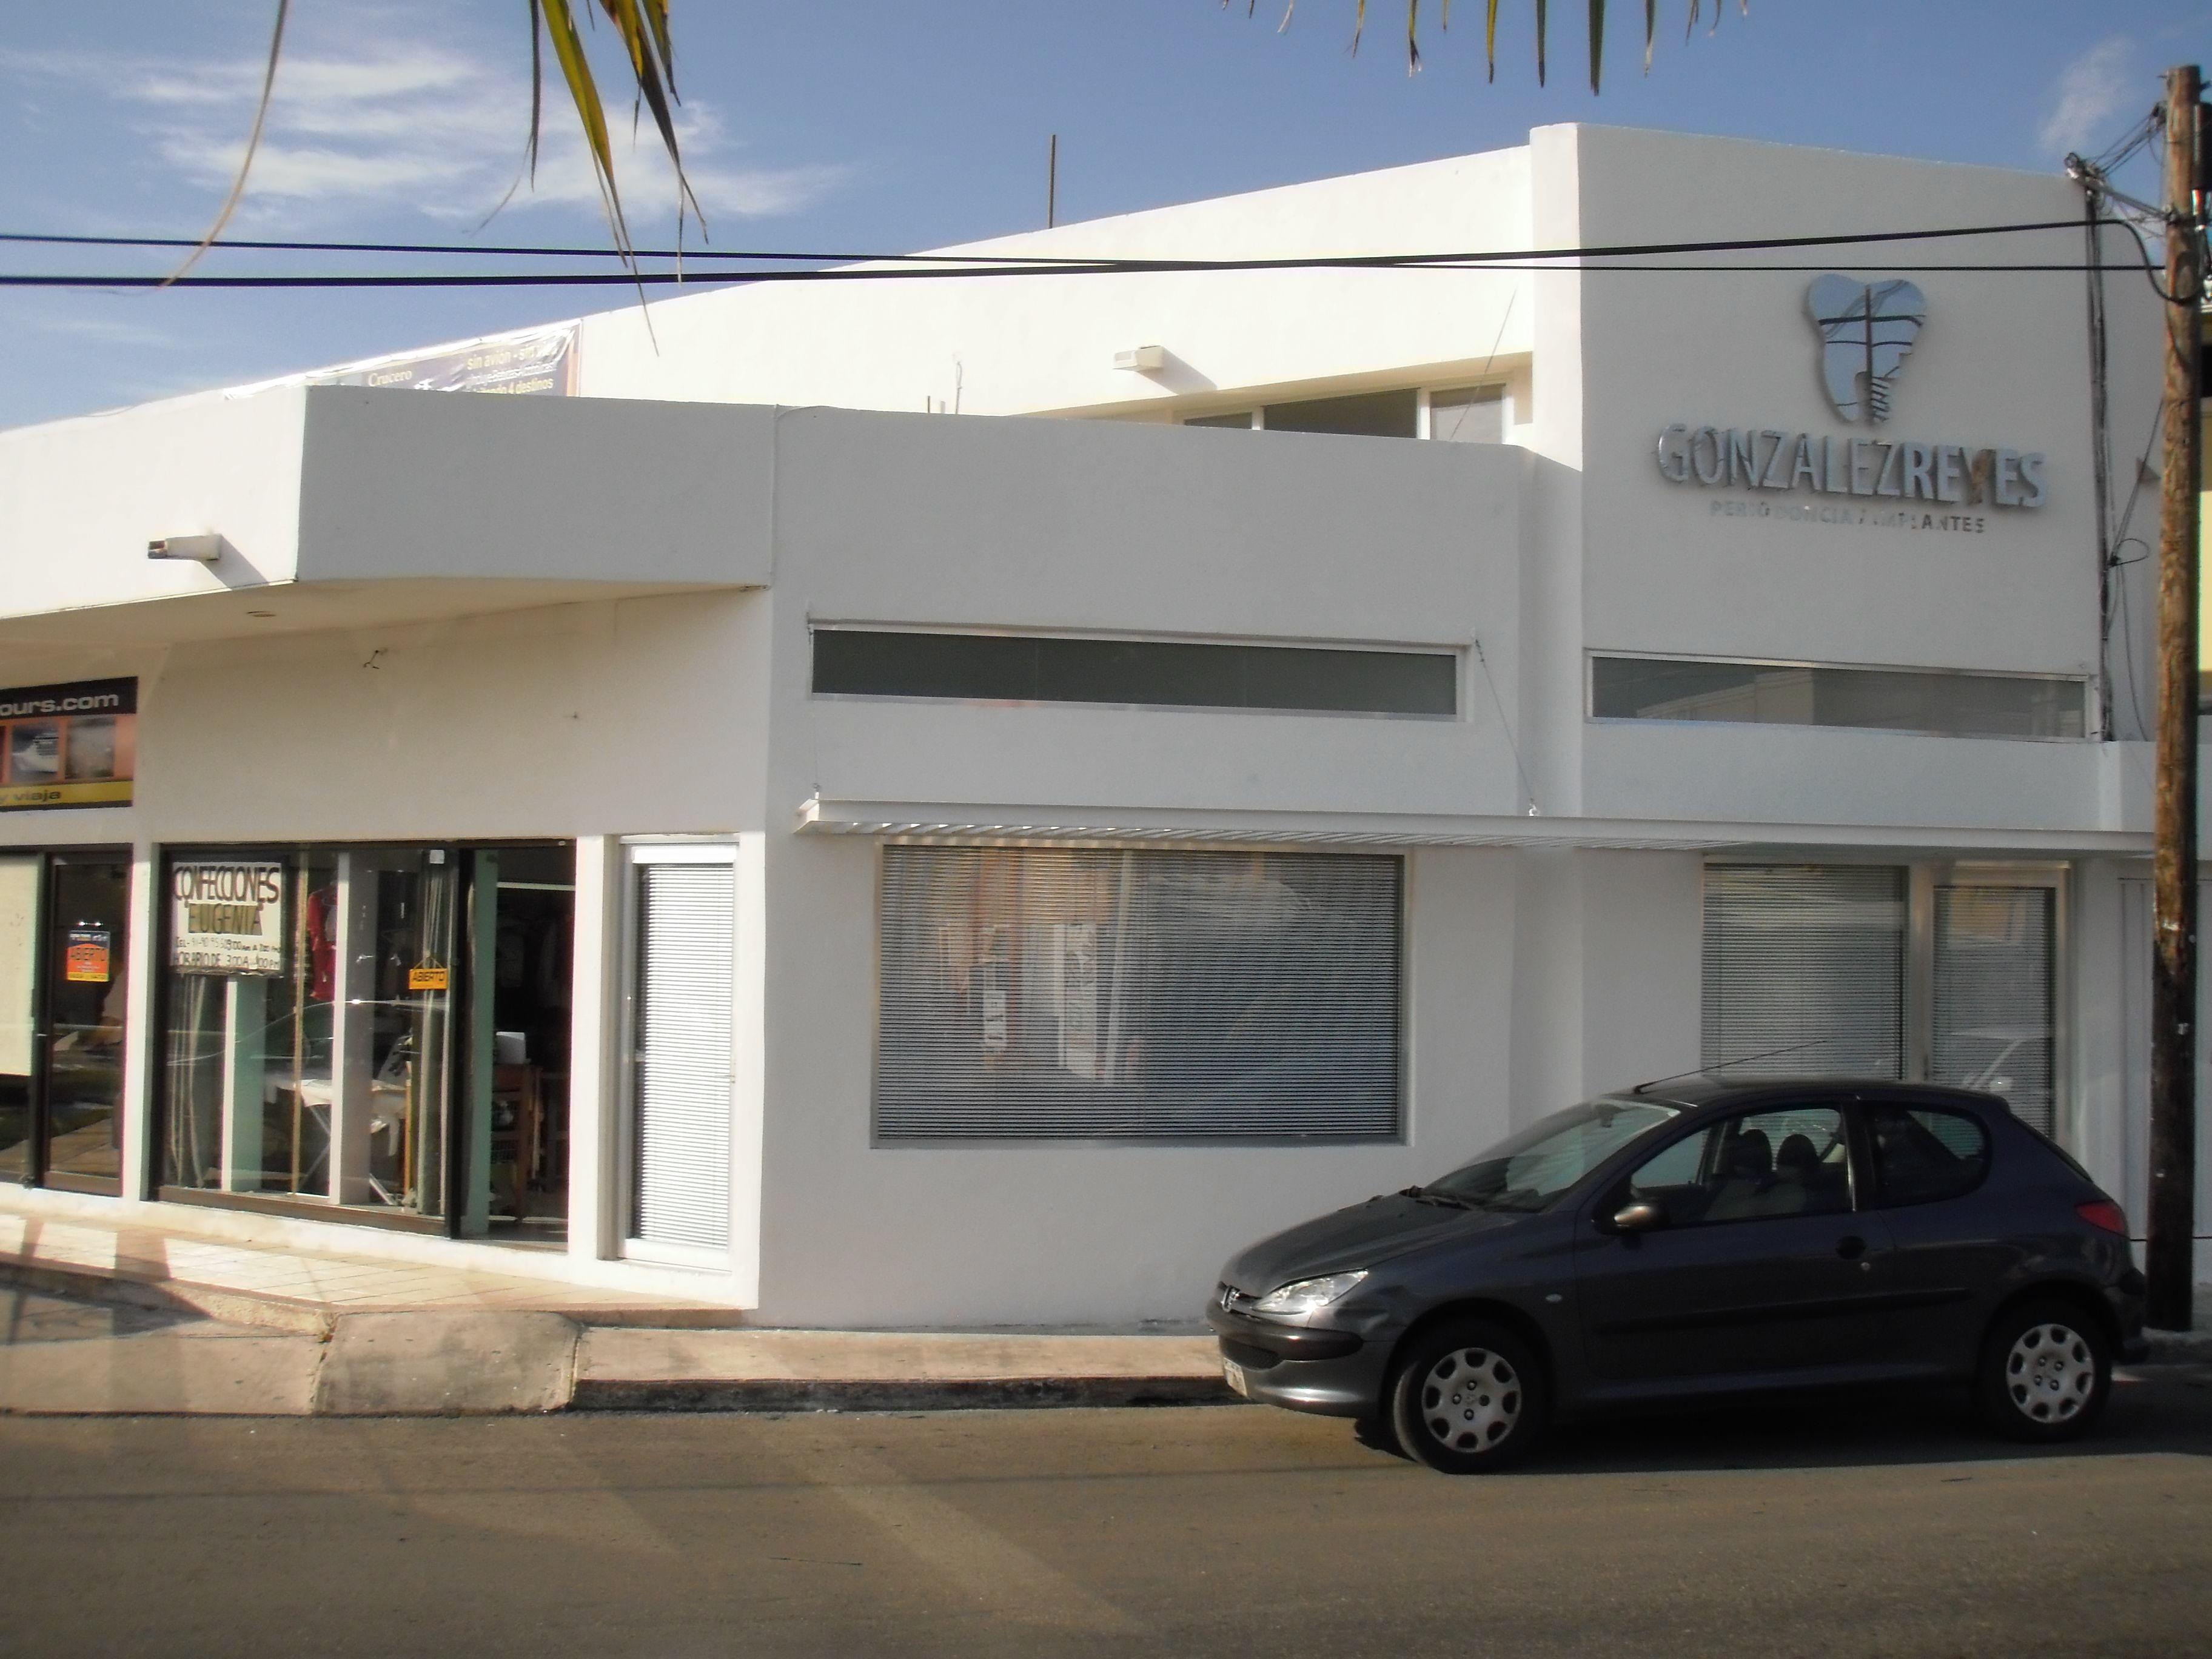 Gonzalez Reyes Dental Clinic